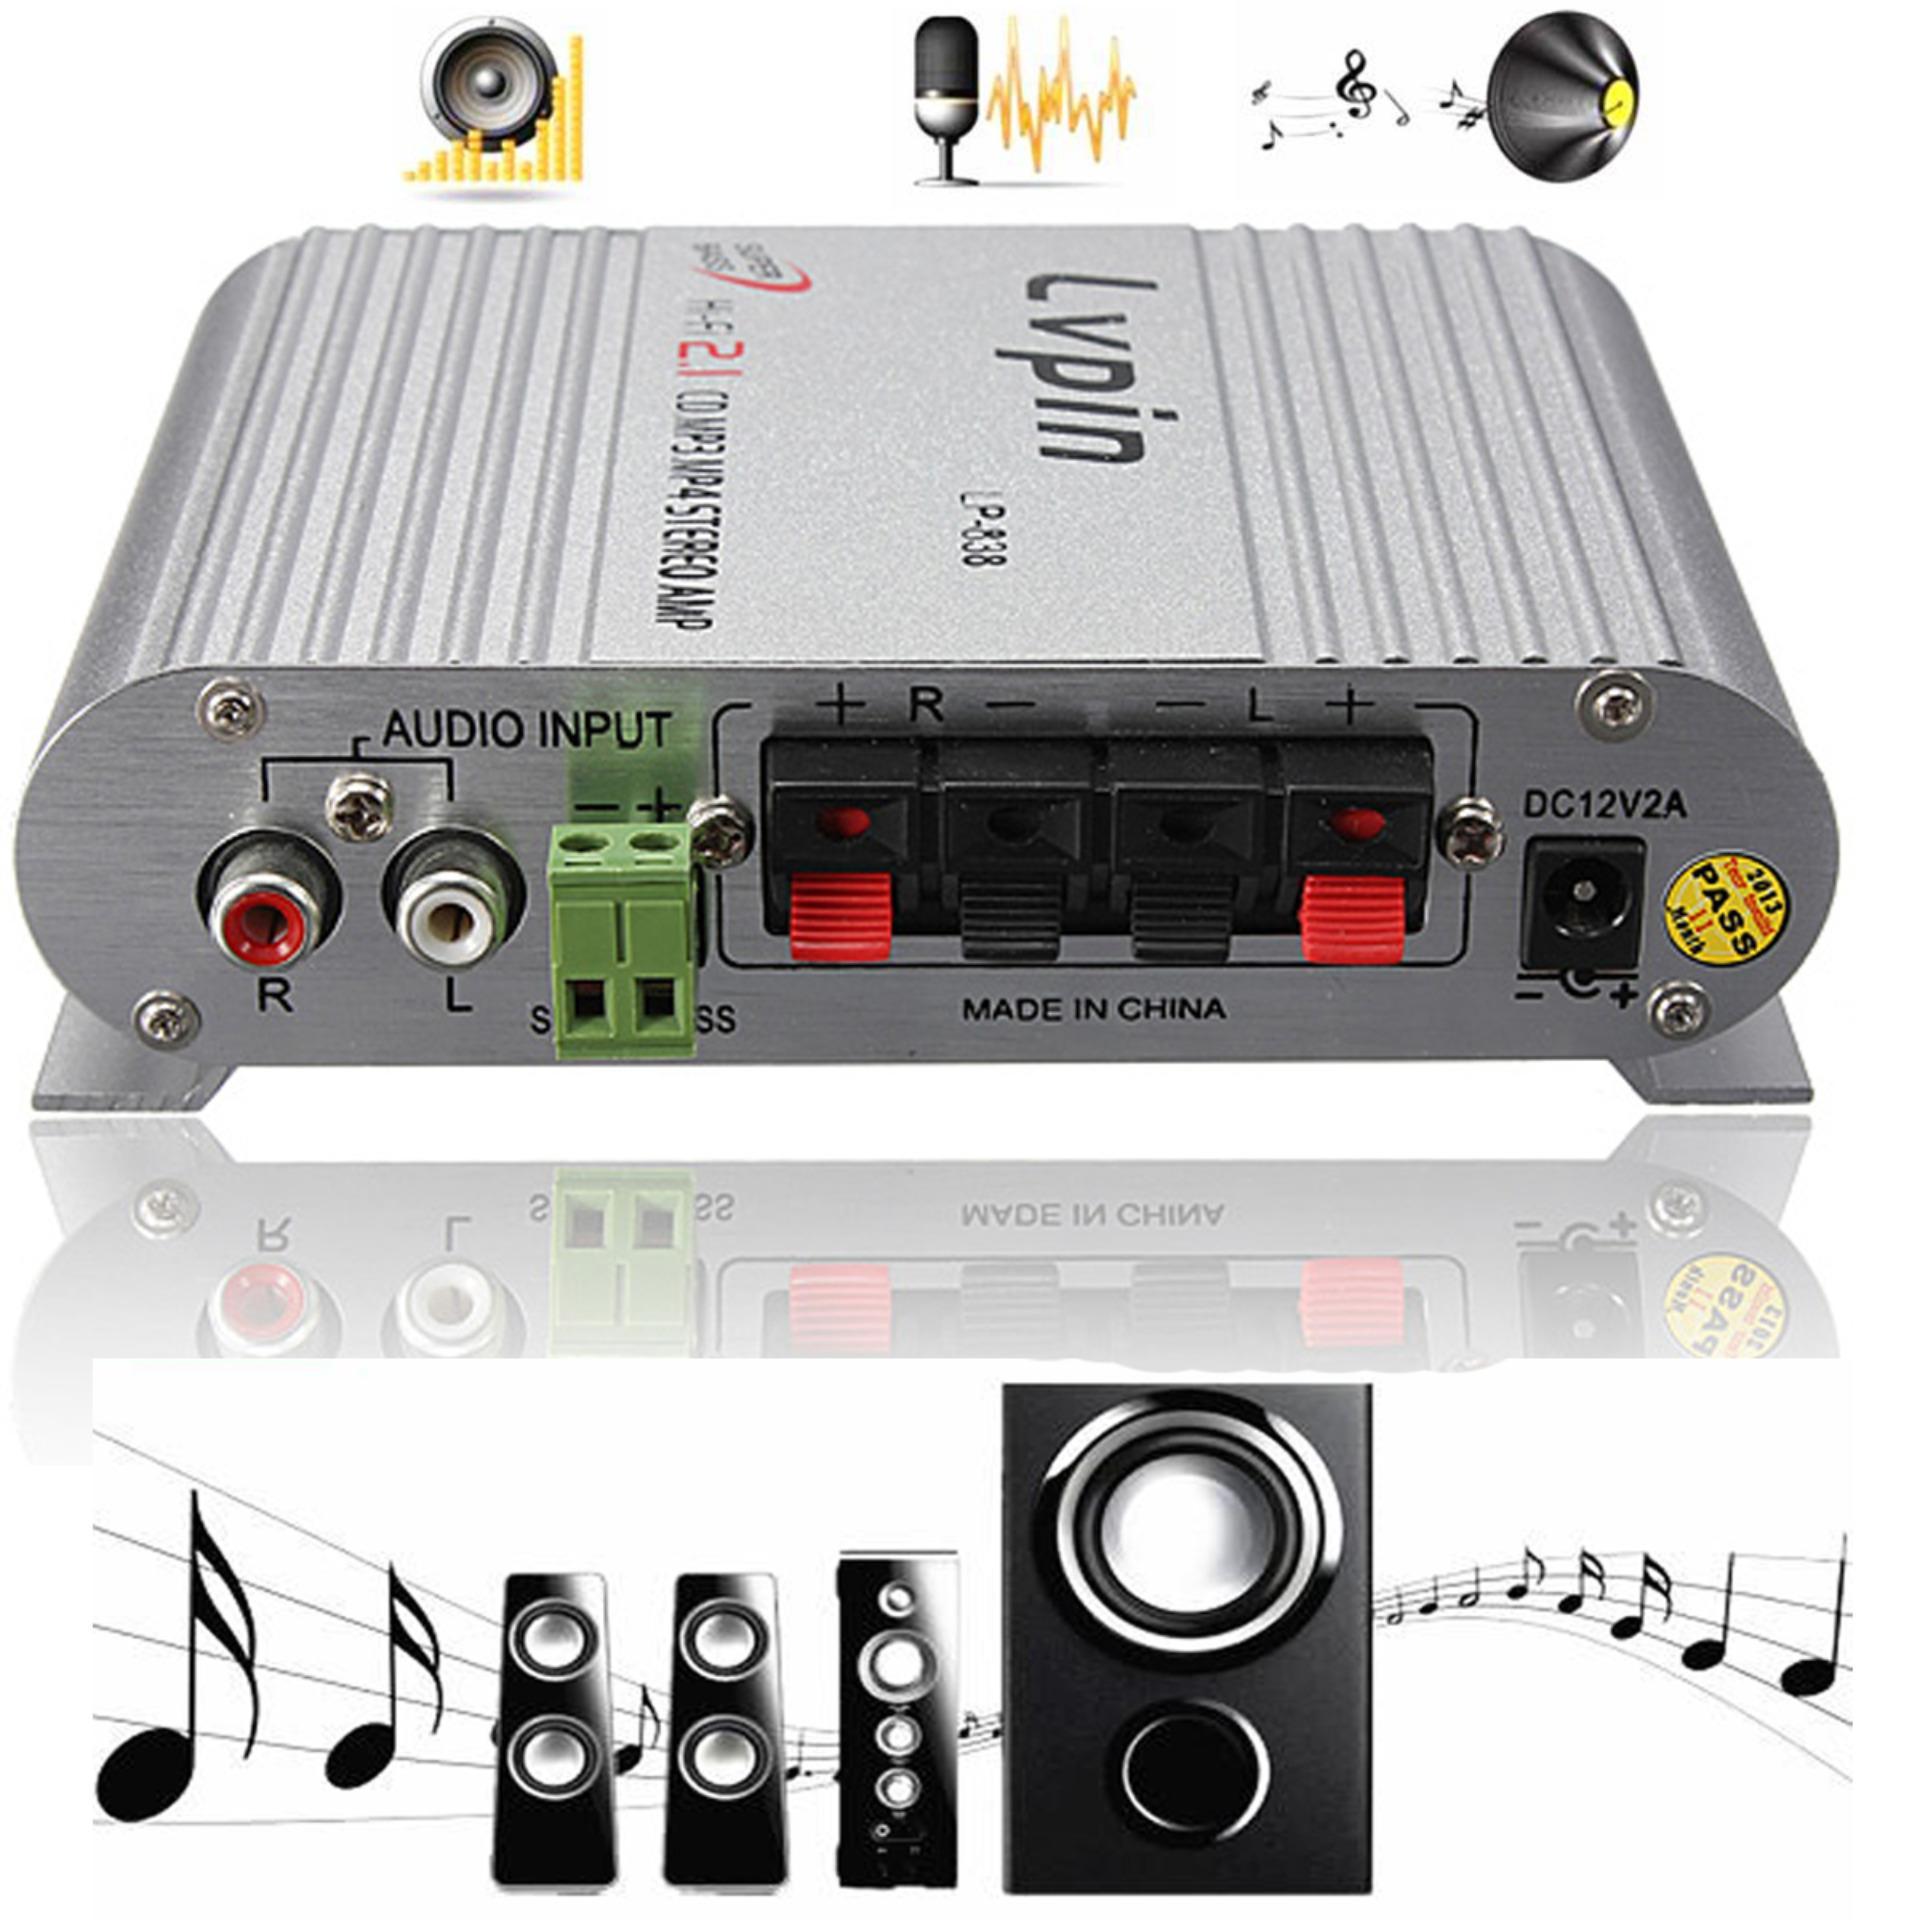 Perbandingan Harga Lvpin 200 Watt 12 V Super Bas Mini Hi Fi Stereo Radio Channel Amplifier Penguat Mp3 Untuk Review Mobil Rumah Oem Di Dki Jakarta